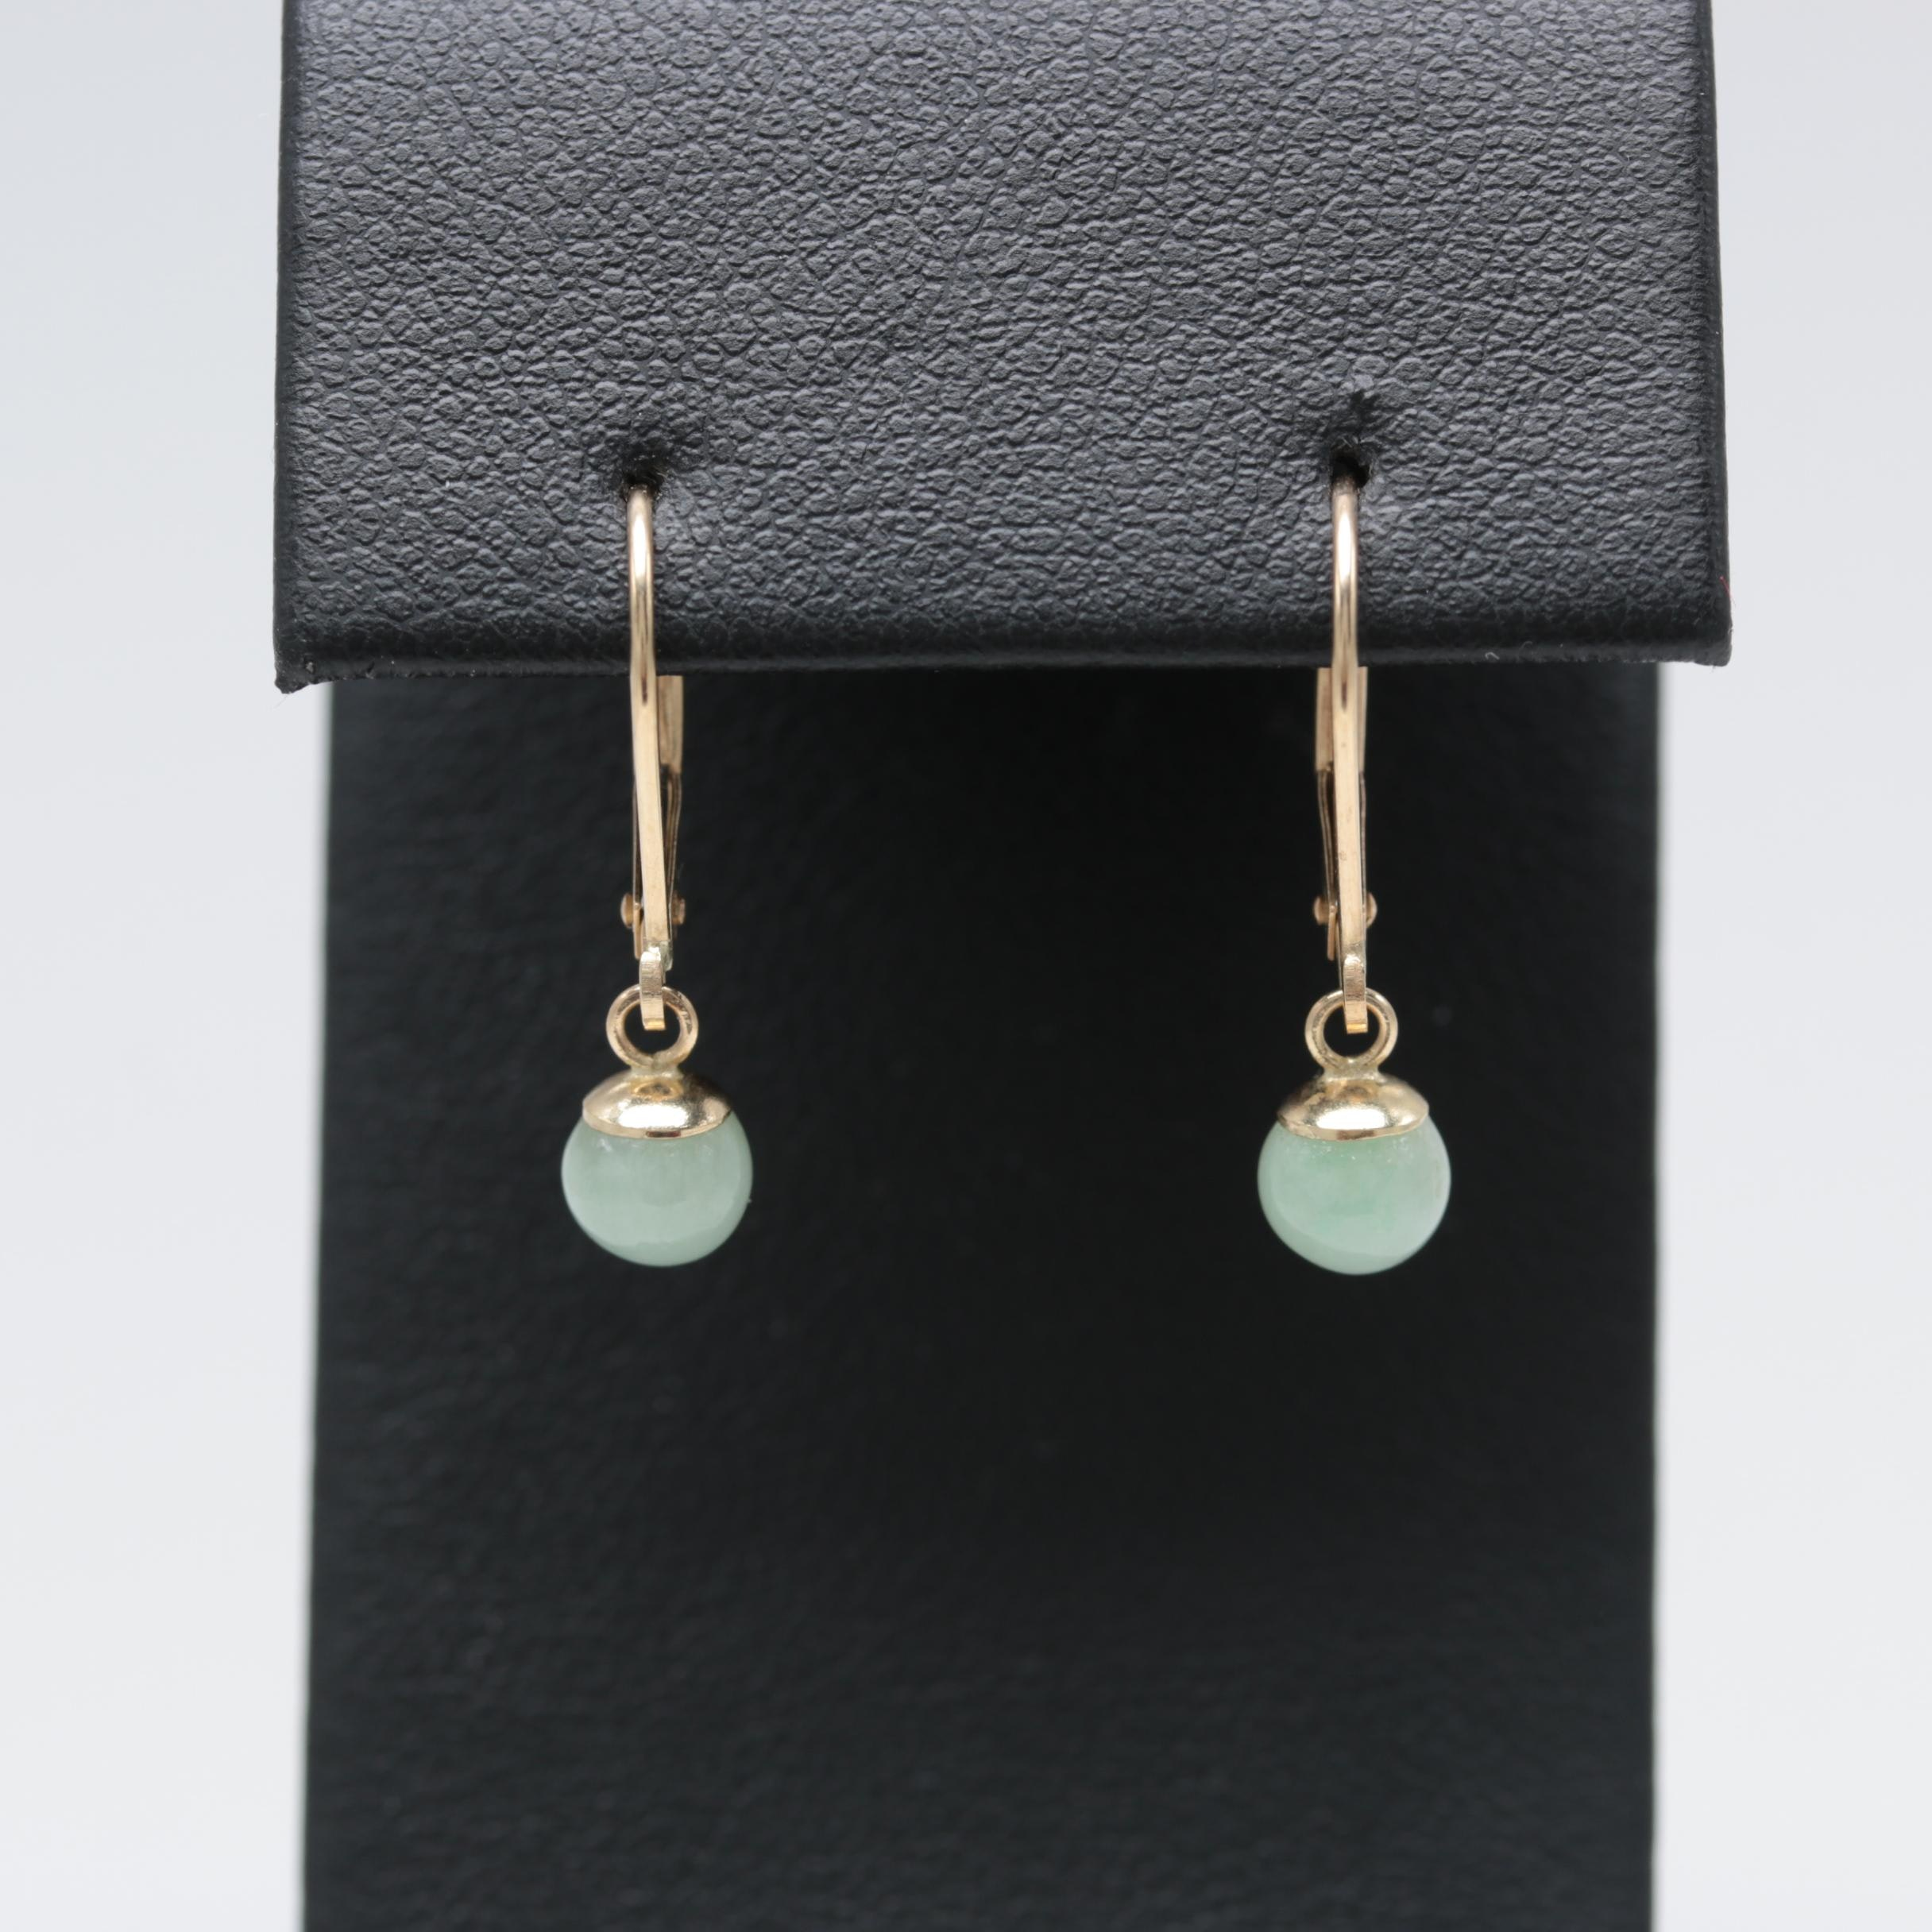 14K Yellow Gold Dangle Jadeite Earrings